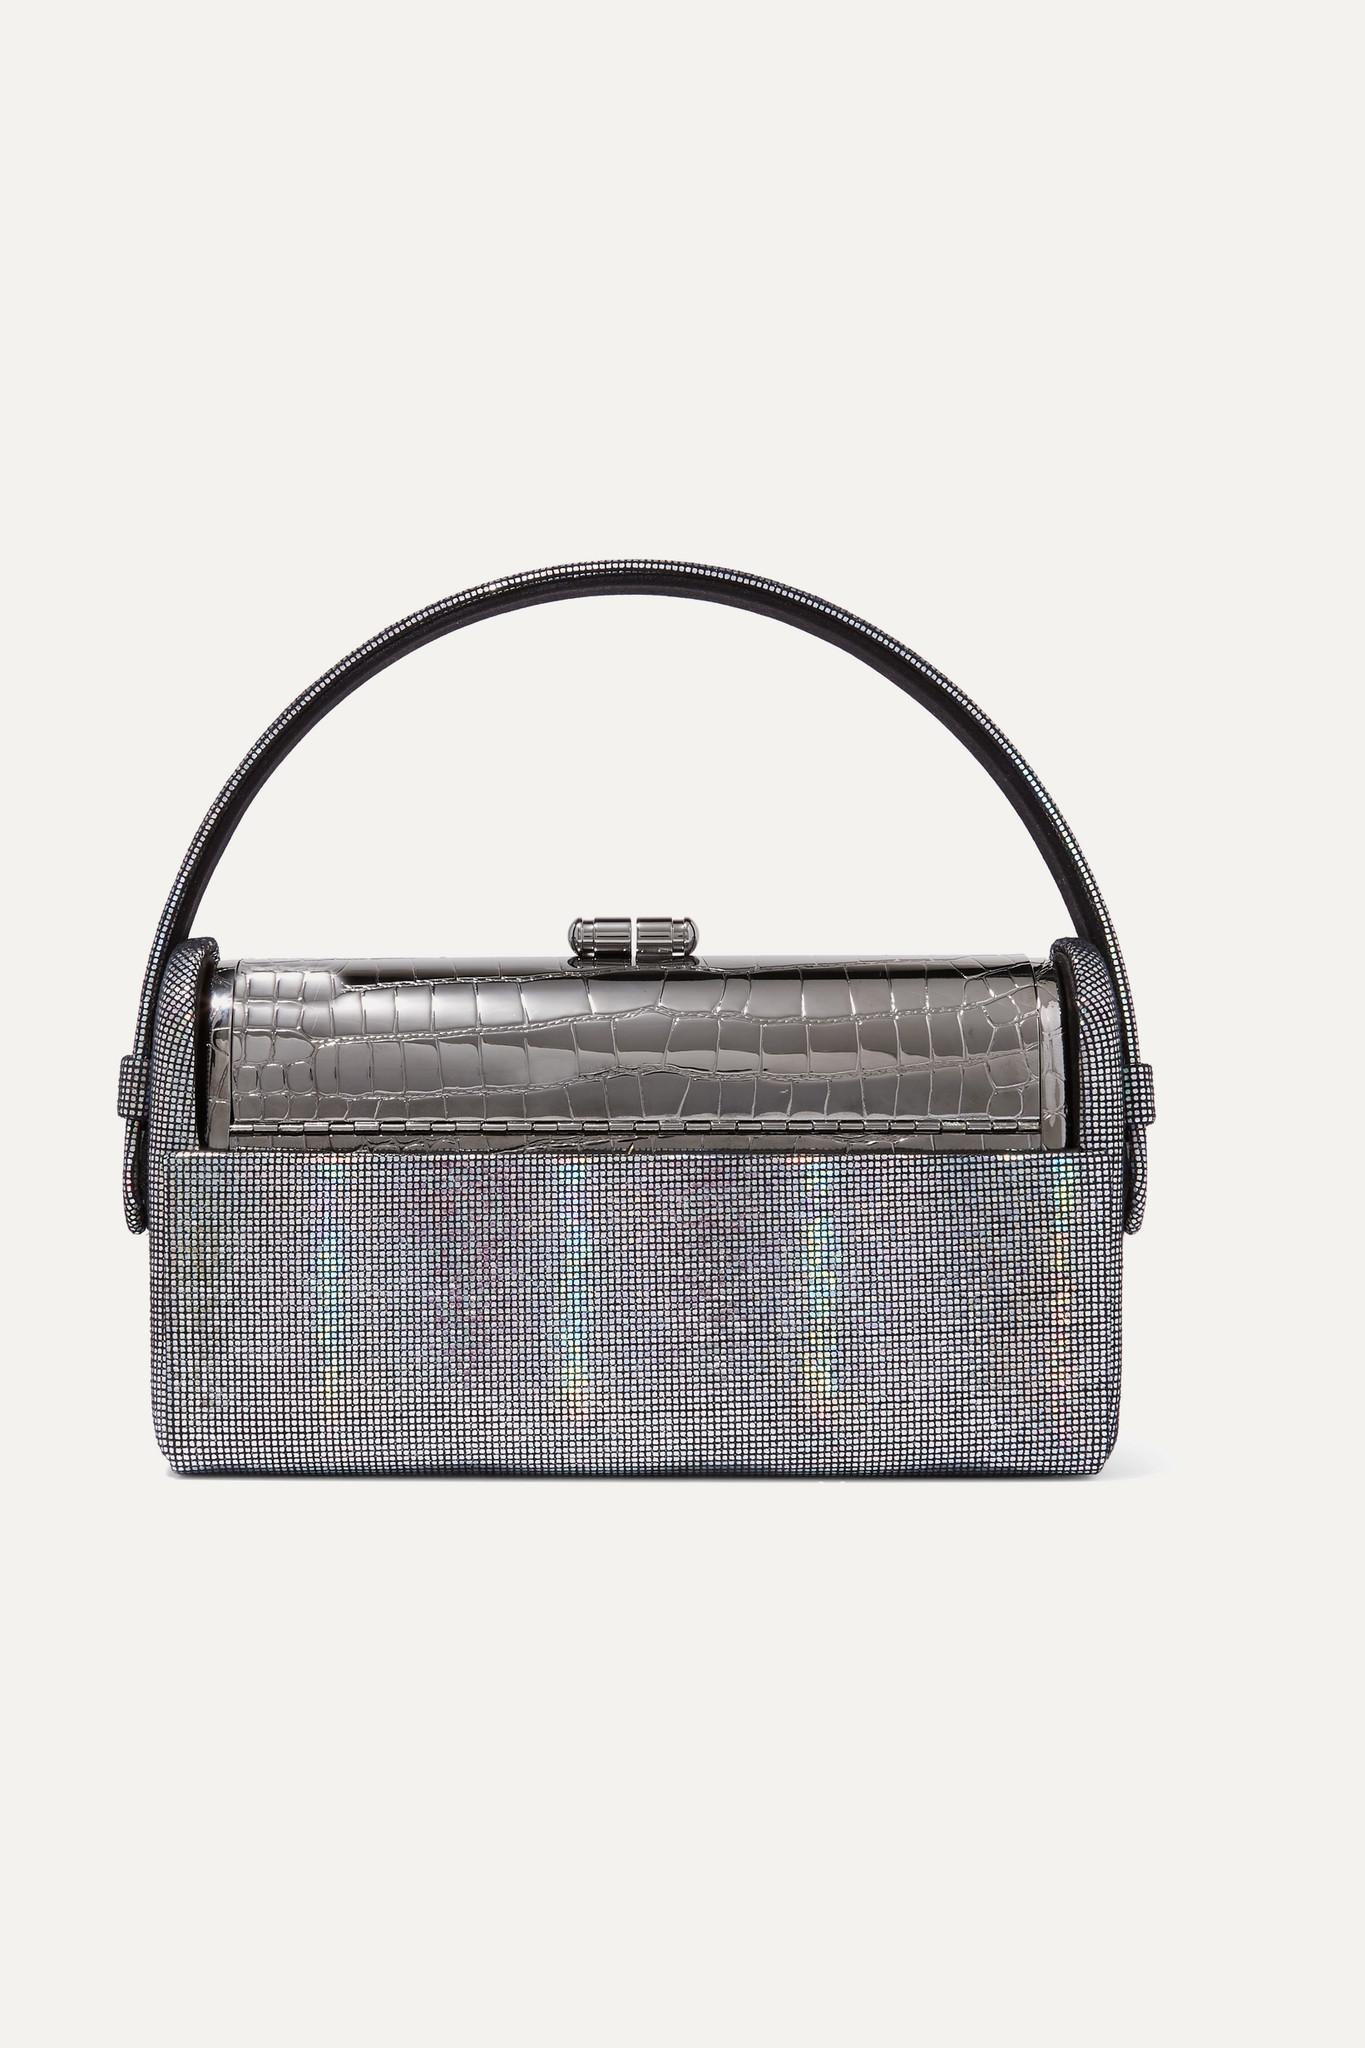 BIENEN-DAVIS - Régine 虹彩皮革浸镀银手提包 - 金属色 - One size